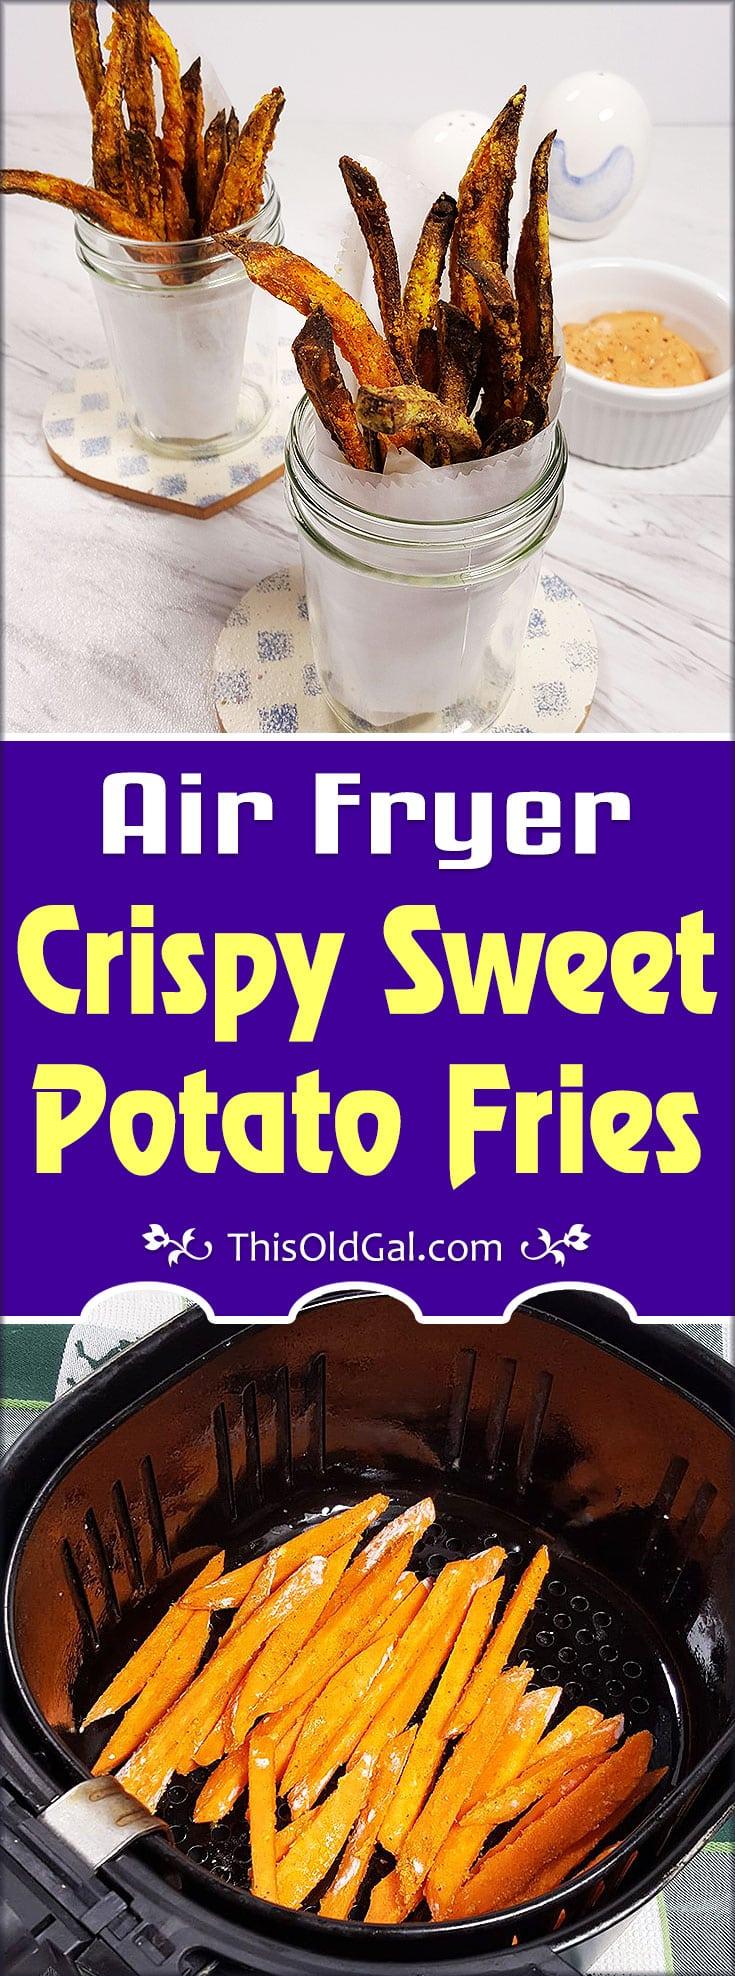 Easy Air Fryer Crispy Sweet Potato Fries Image Air fryer